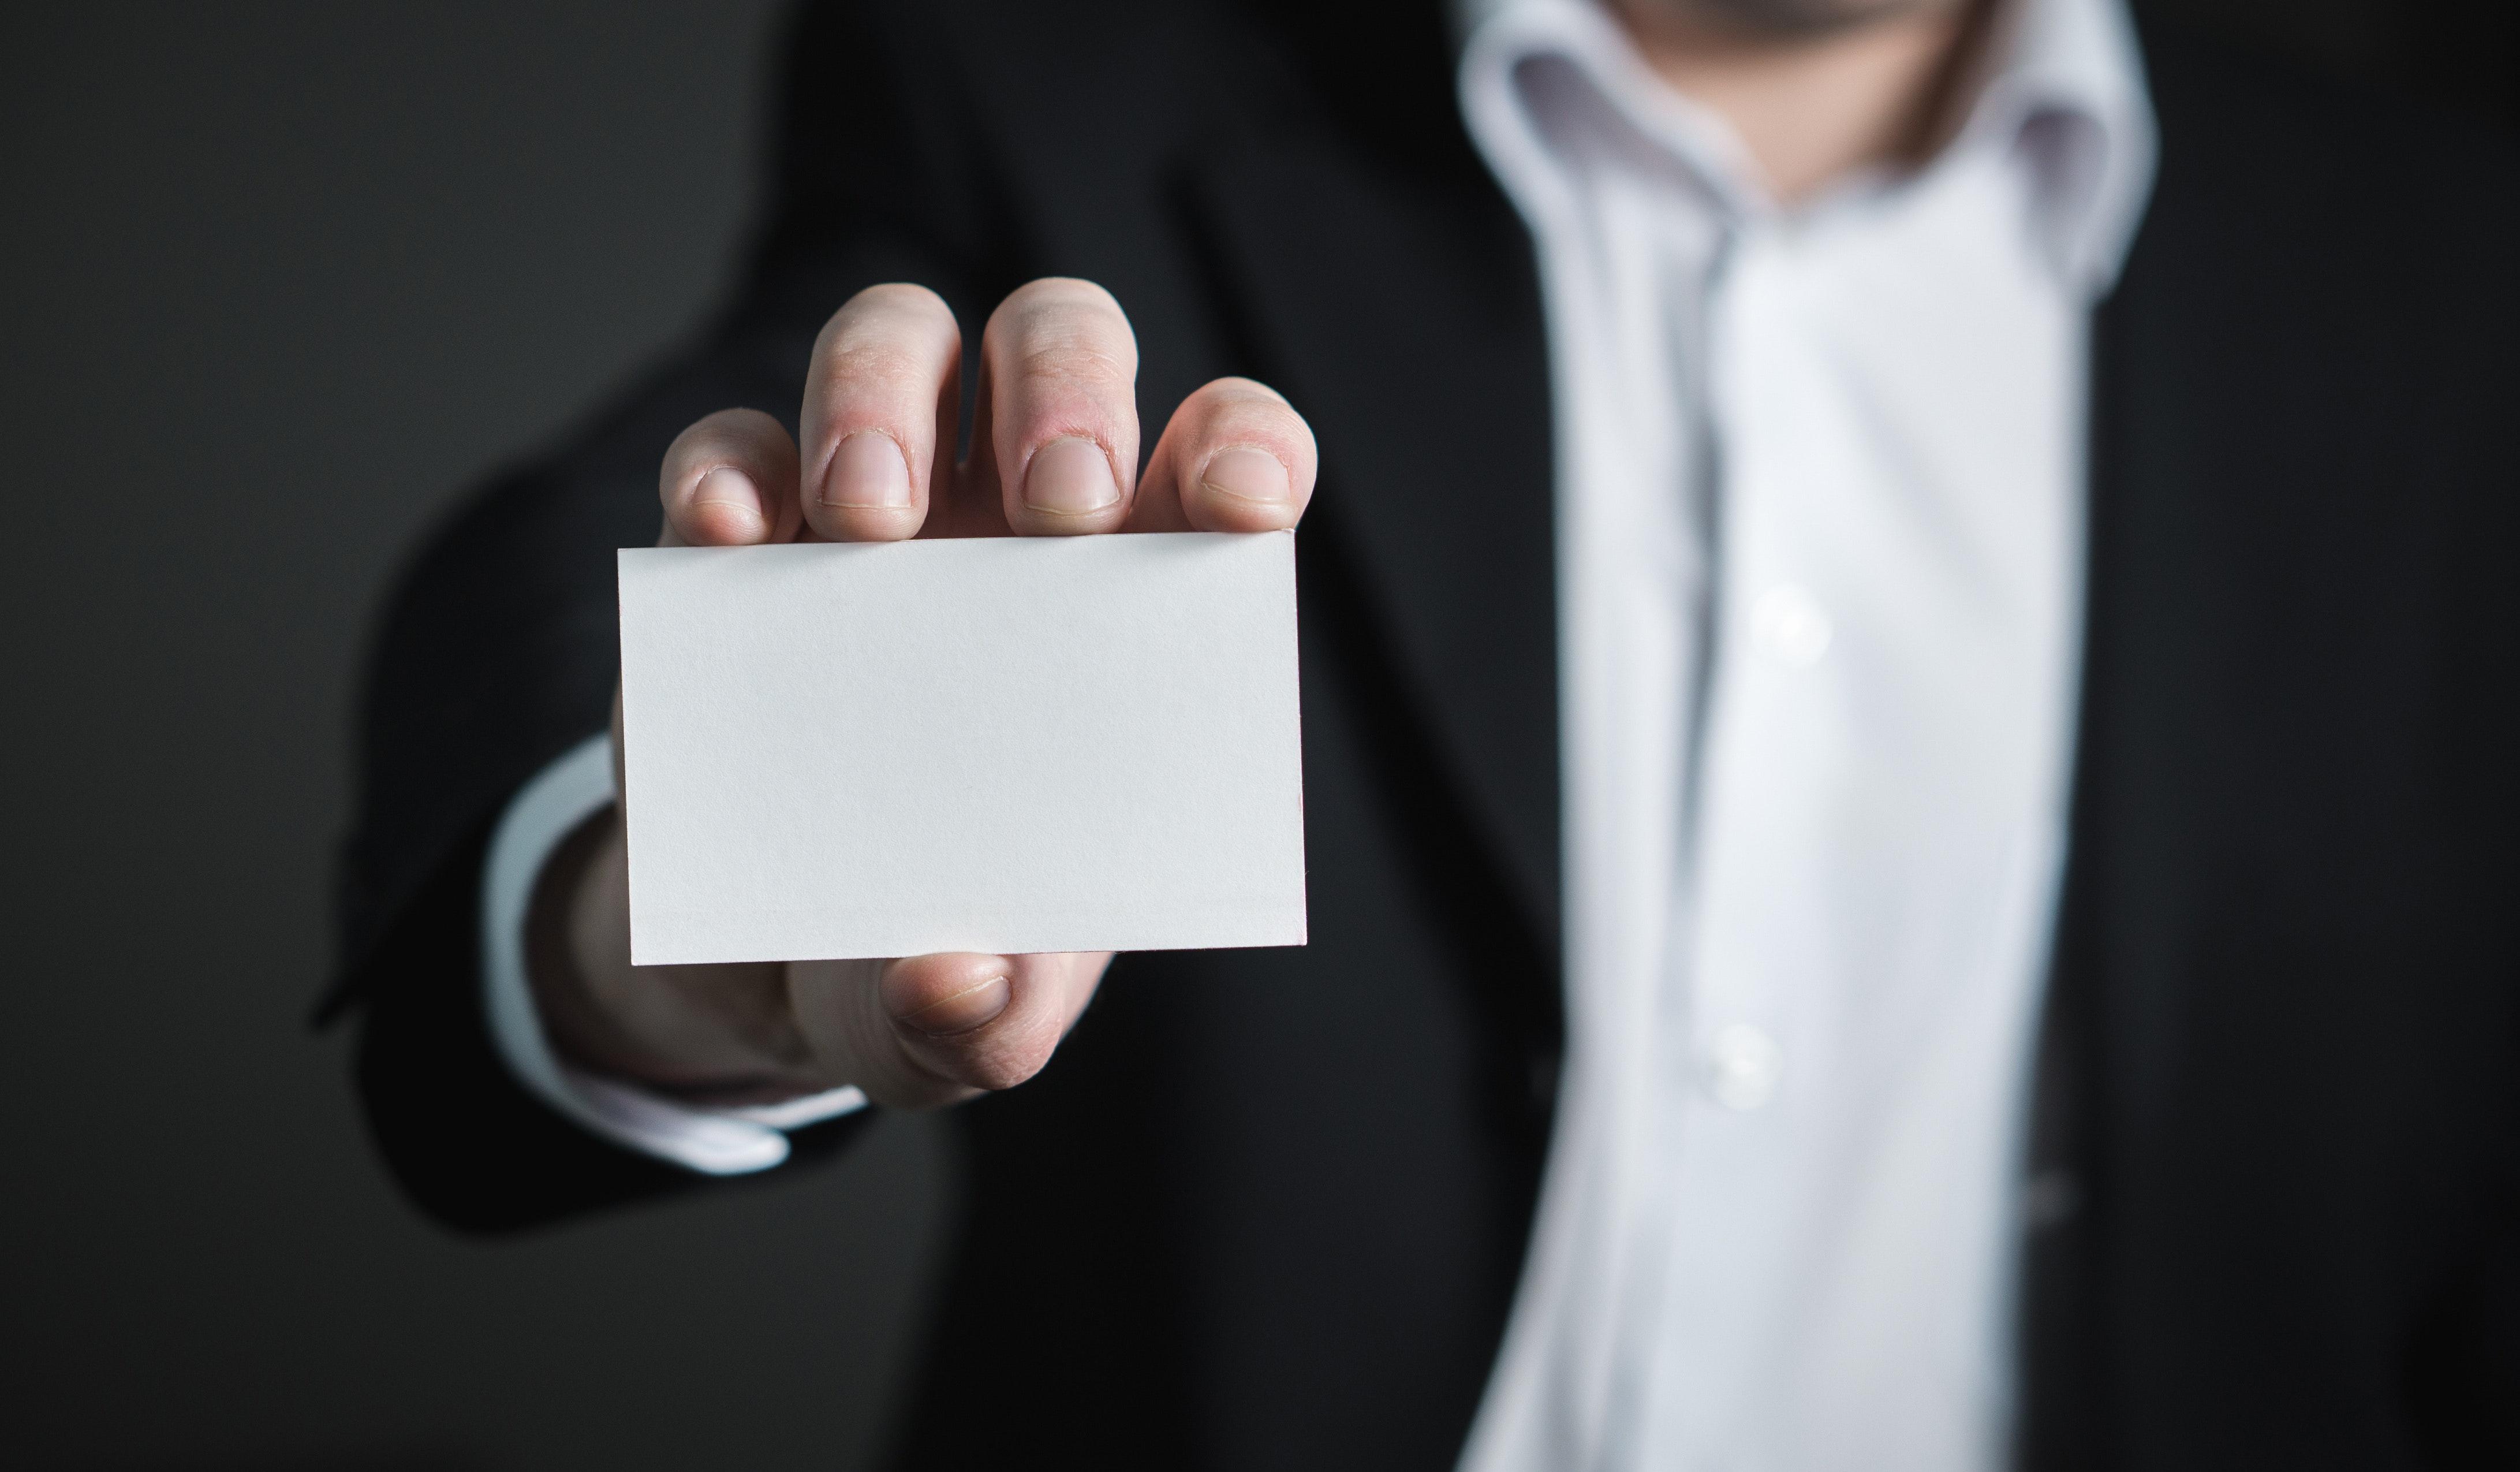 a hand holding a blank card